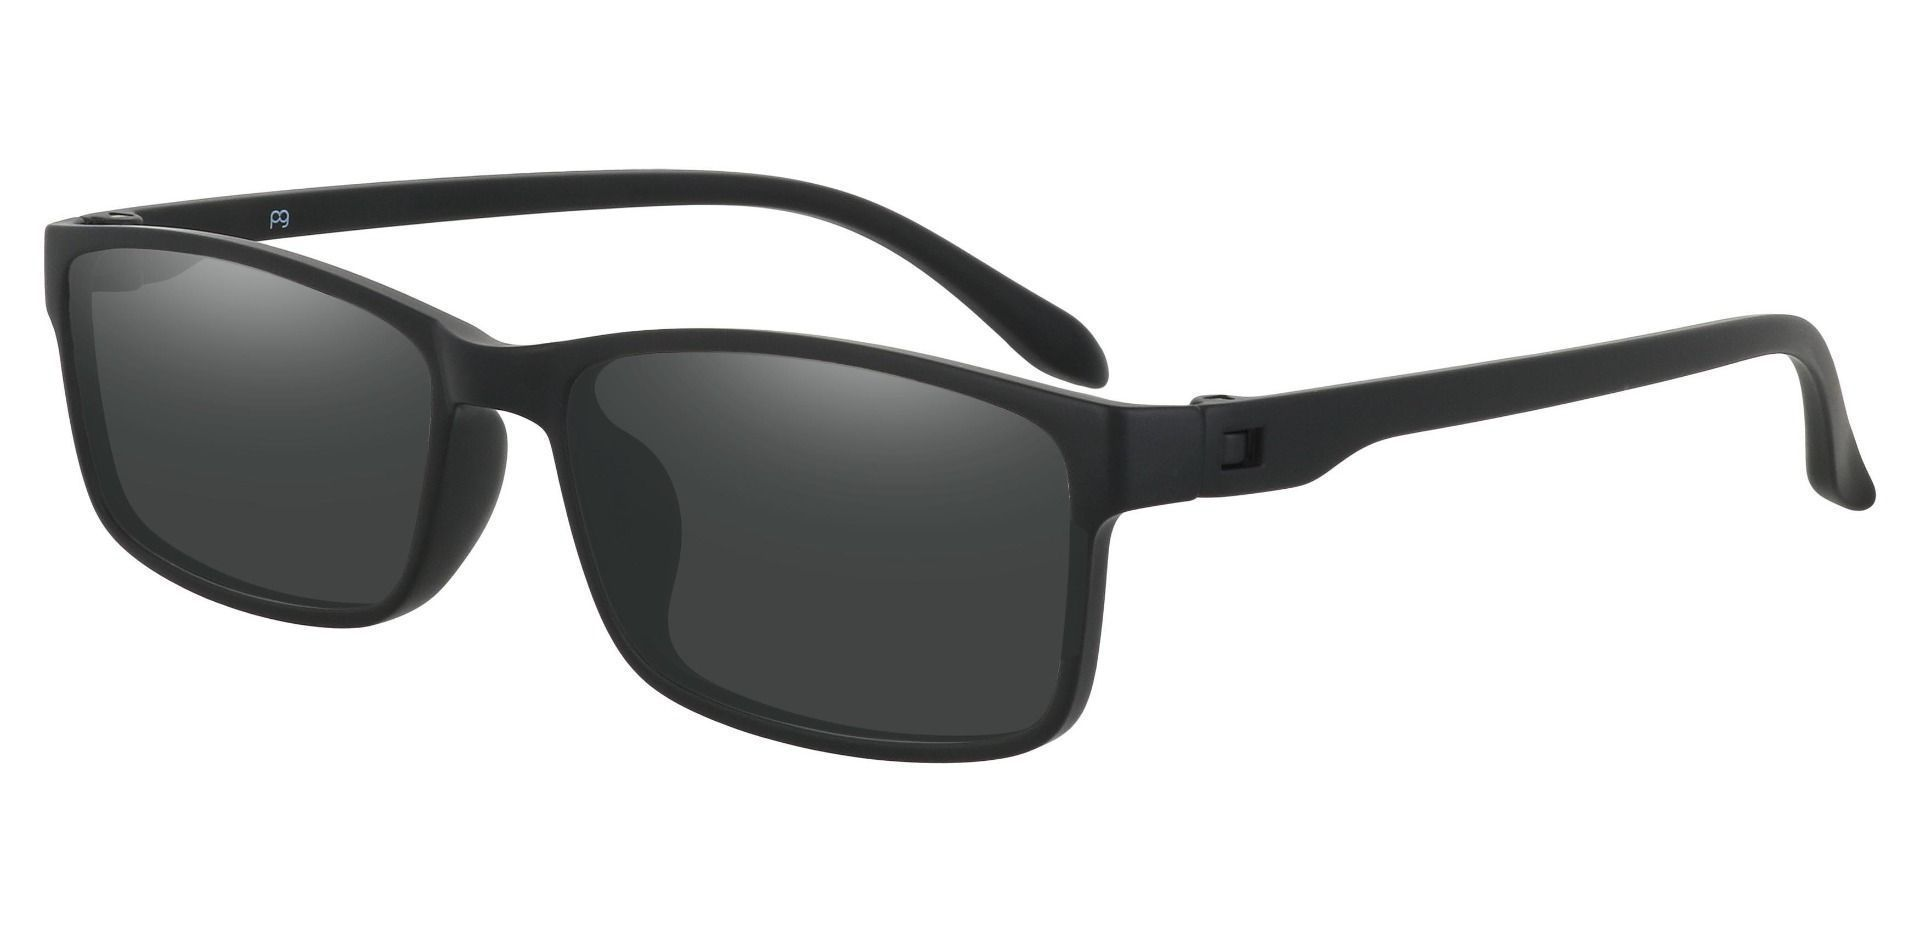 Candice Rectangle Prescription Sunglasses - Black Frame With Gray Lenses